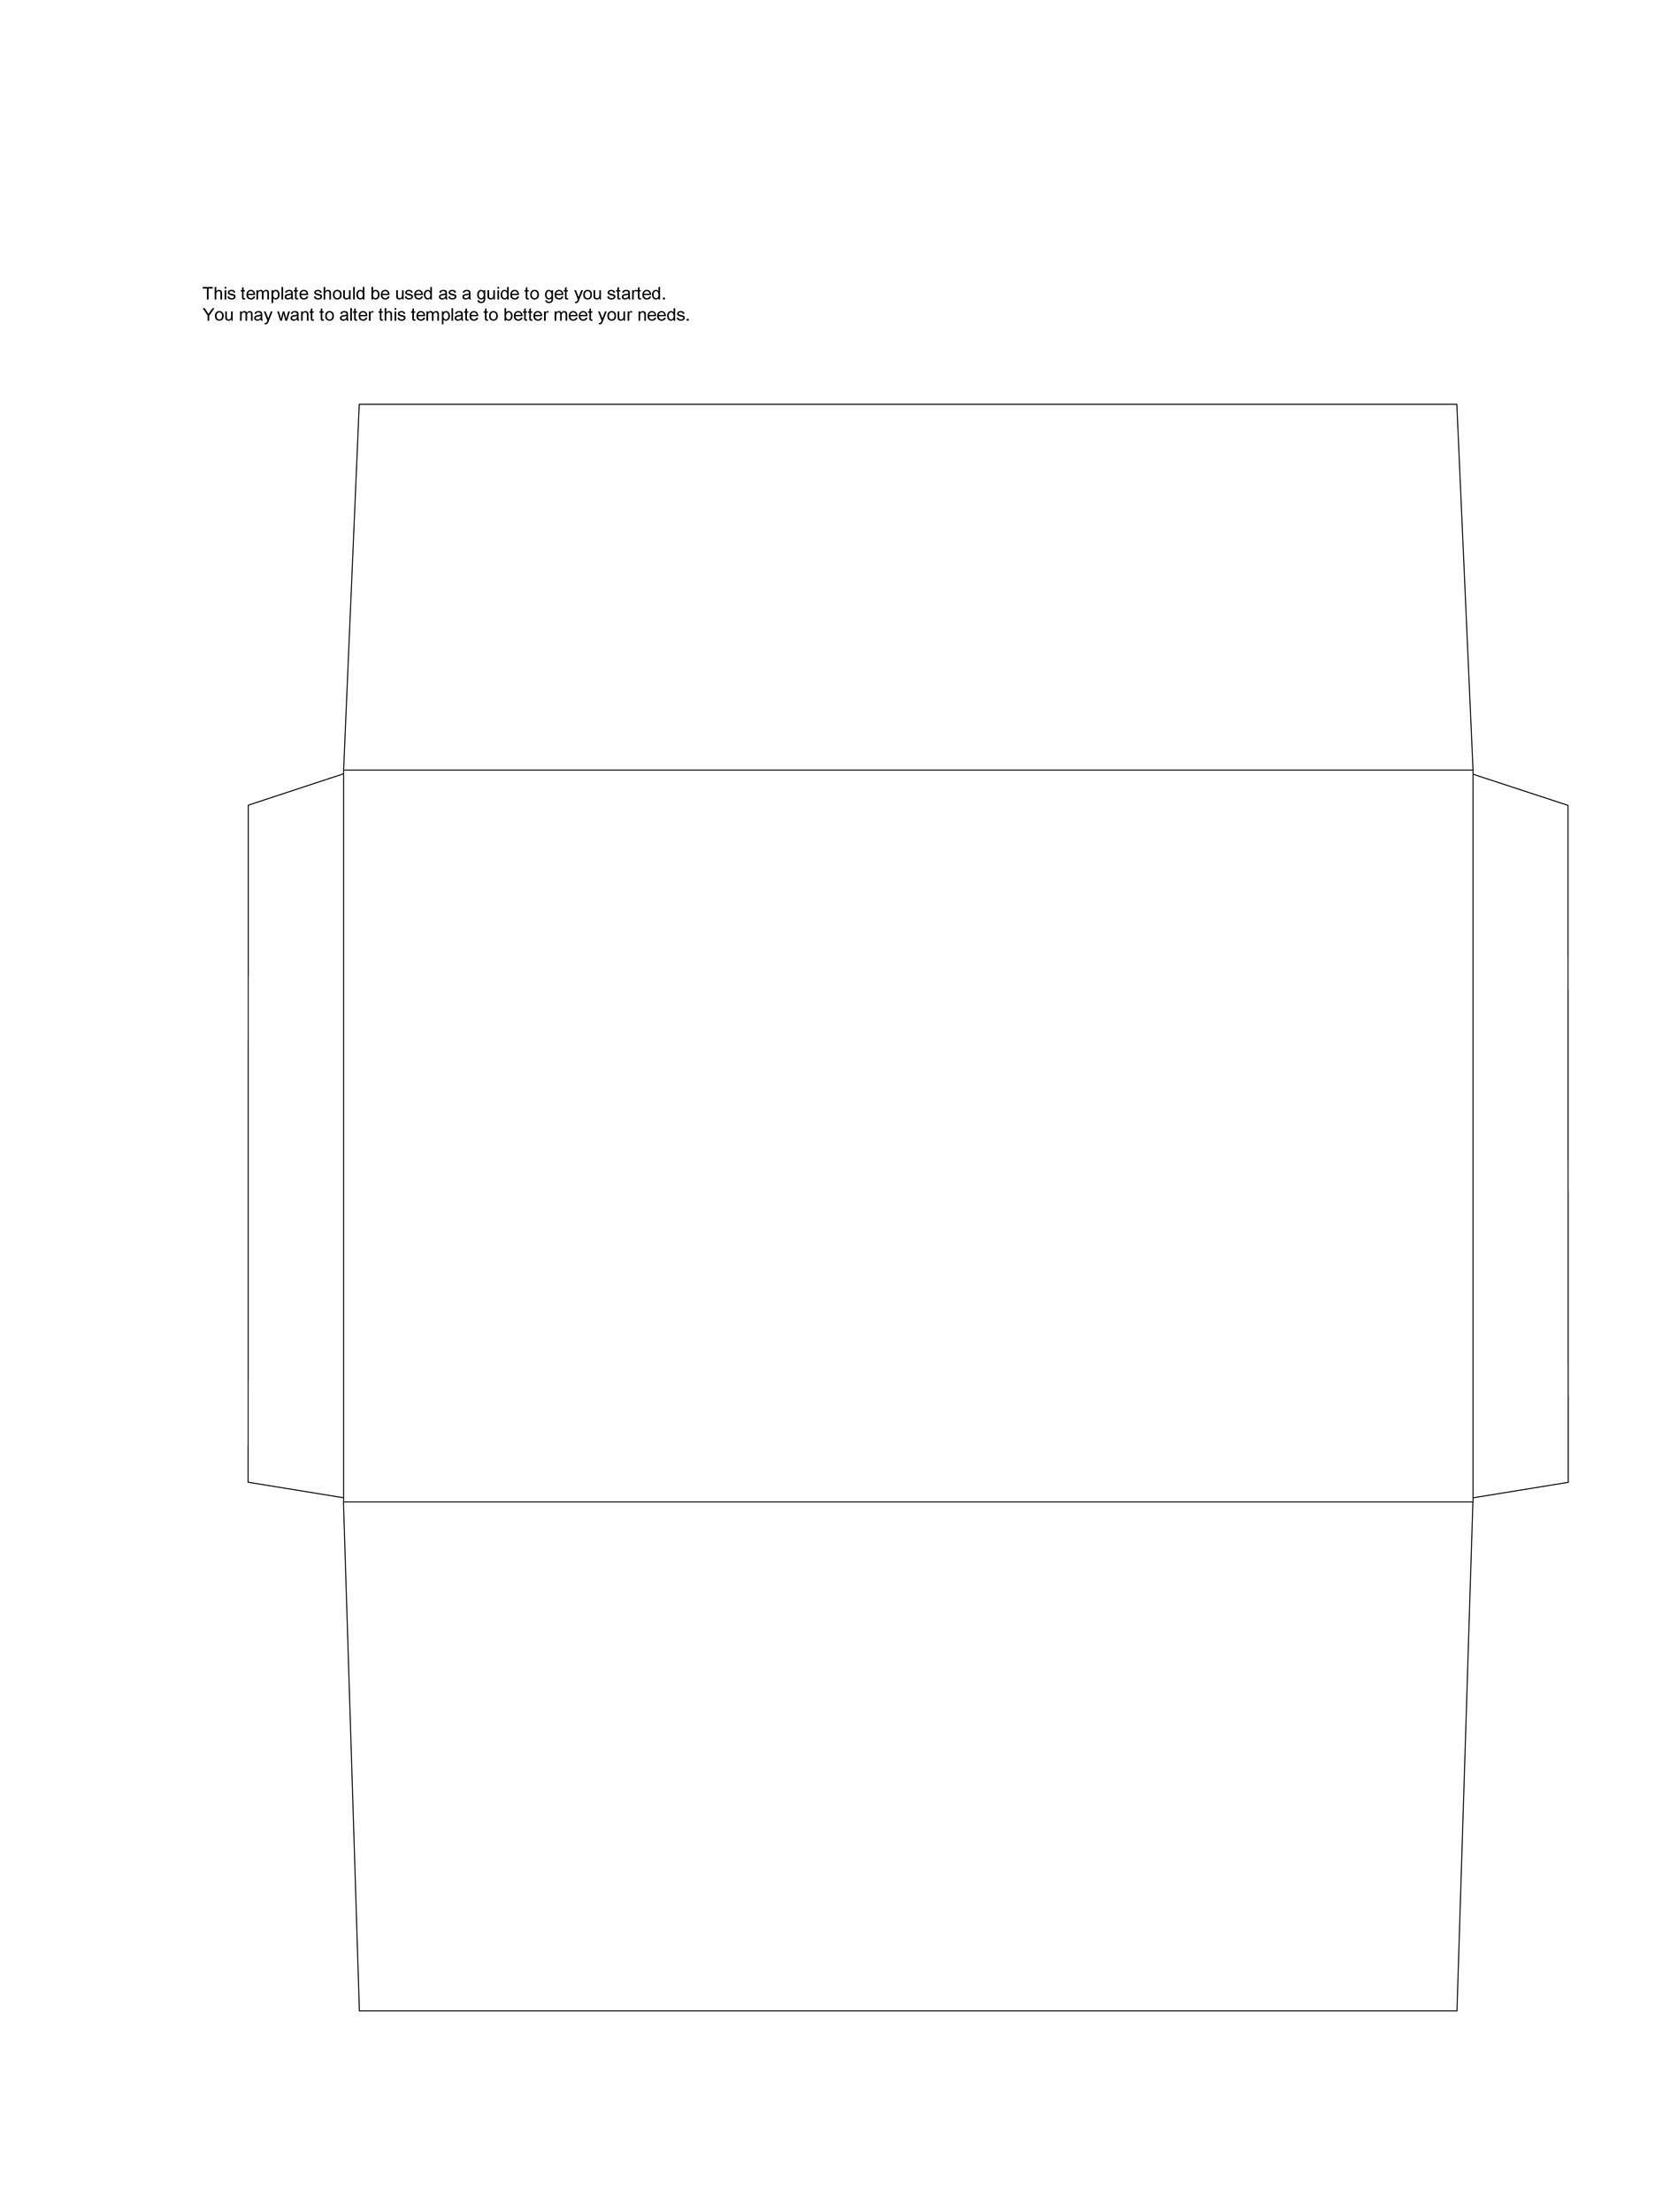 008 Astounding 10 Envelope Template Word Sample  Size Microsoft #10 Double WindowFull